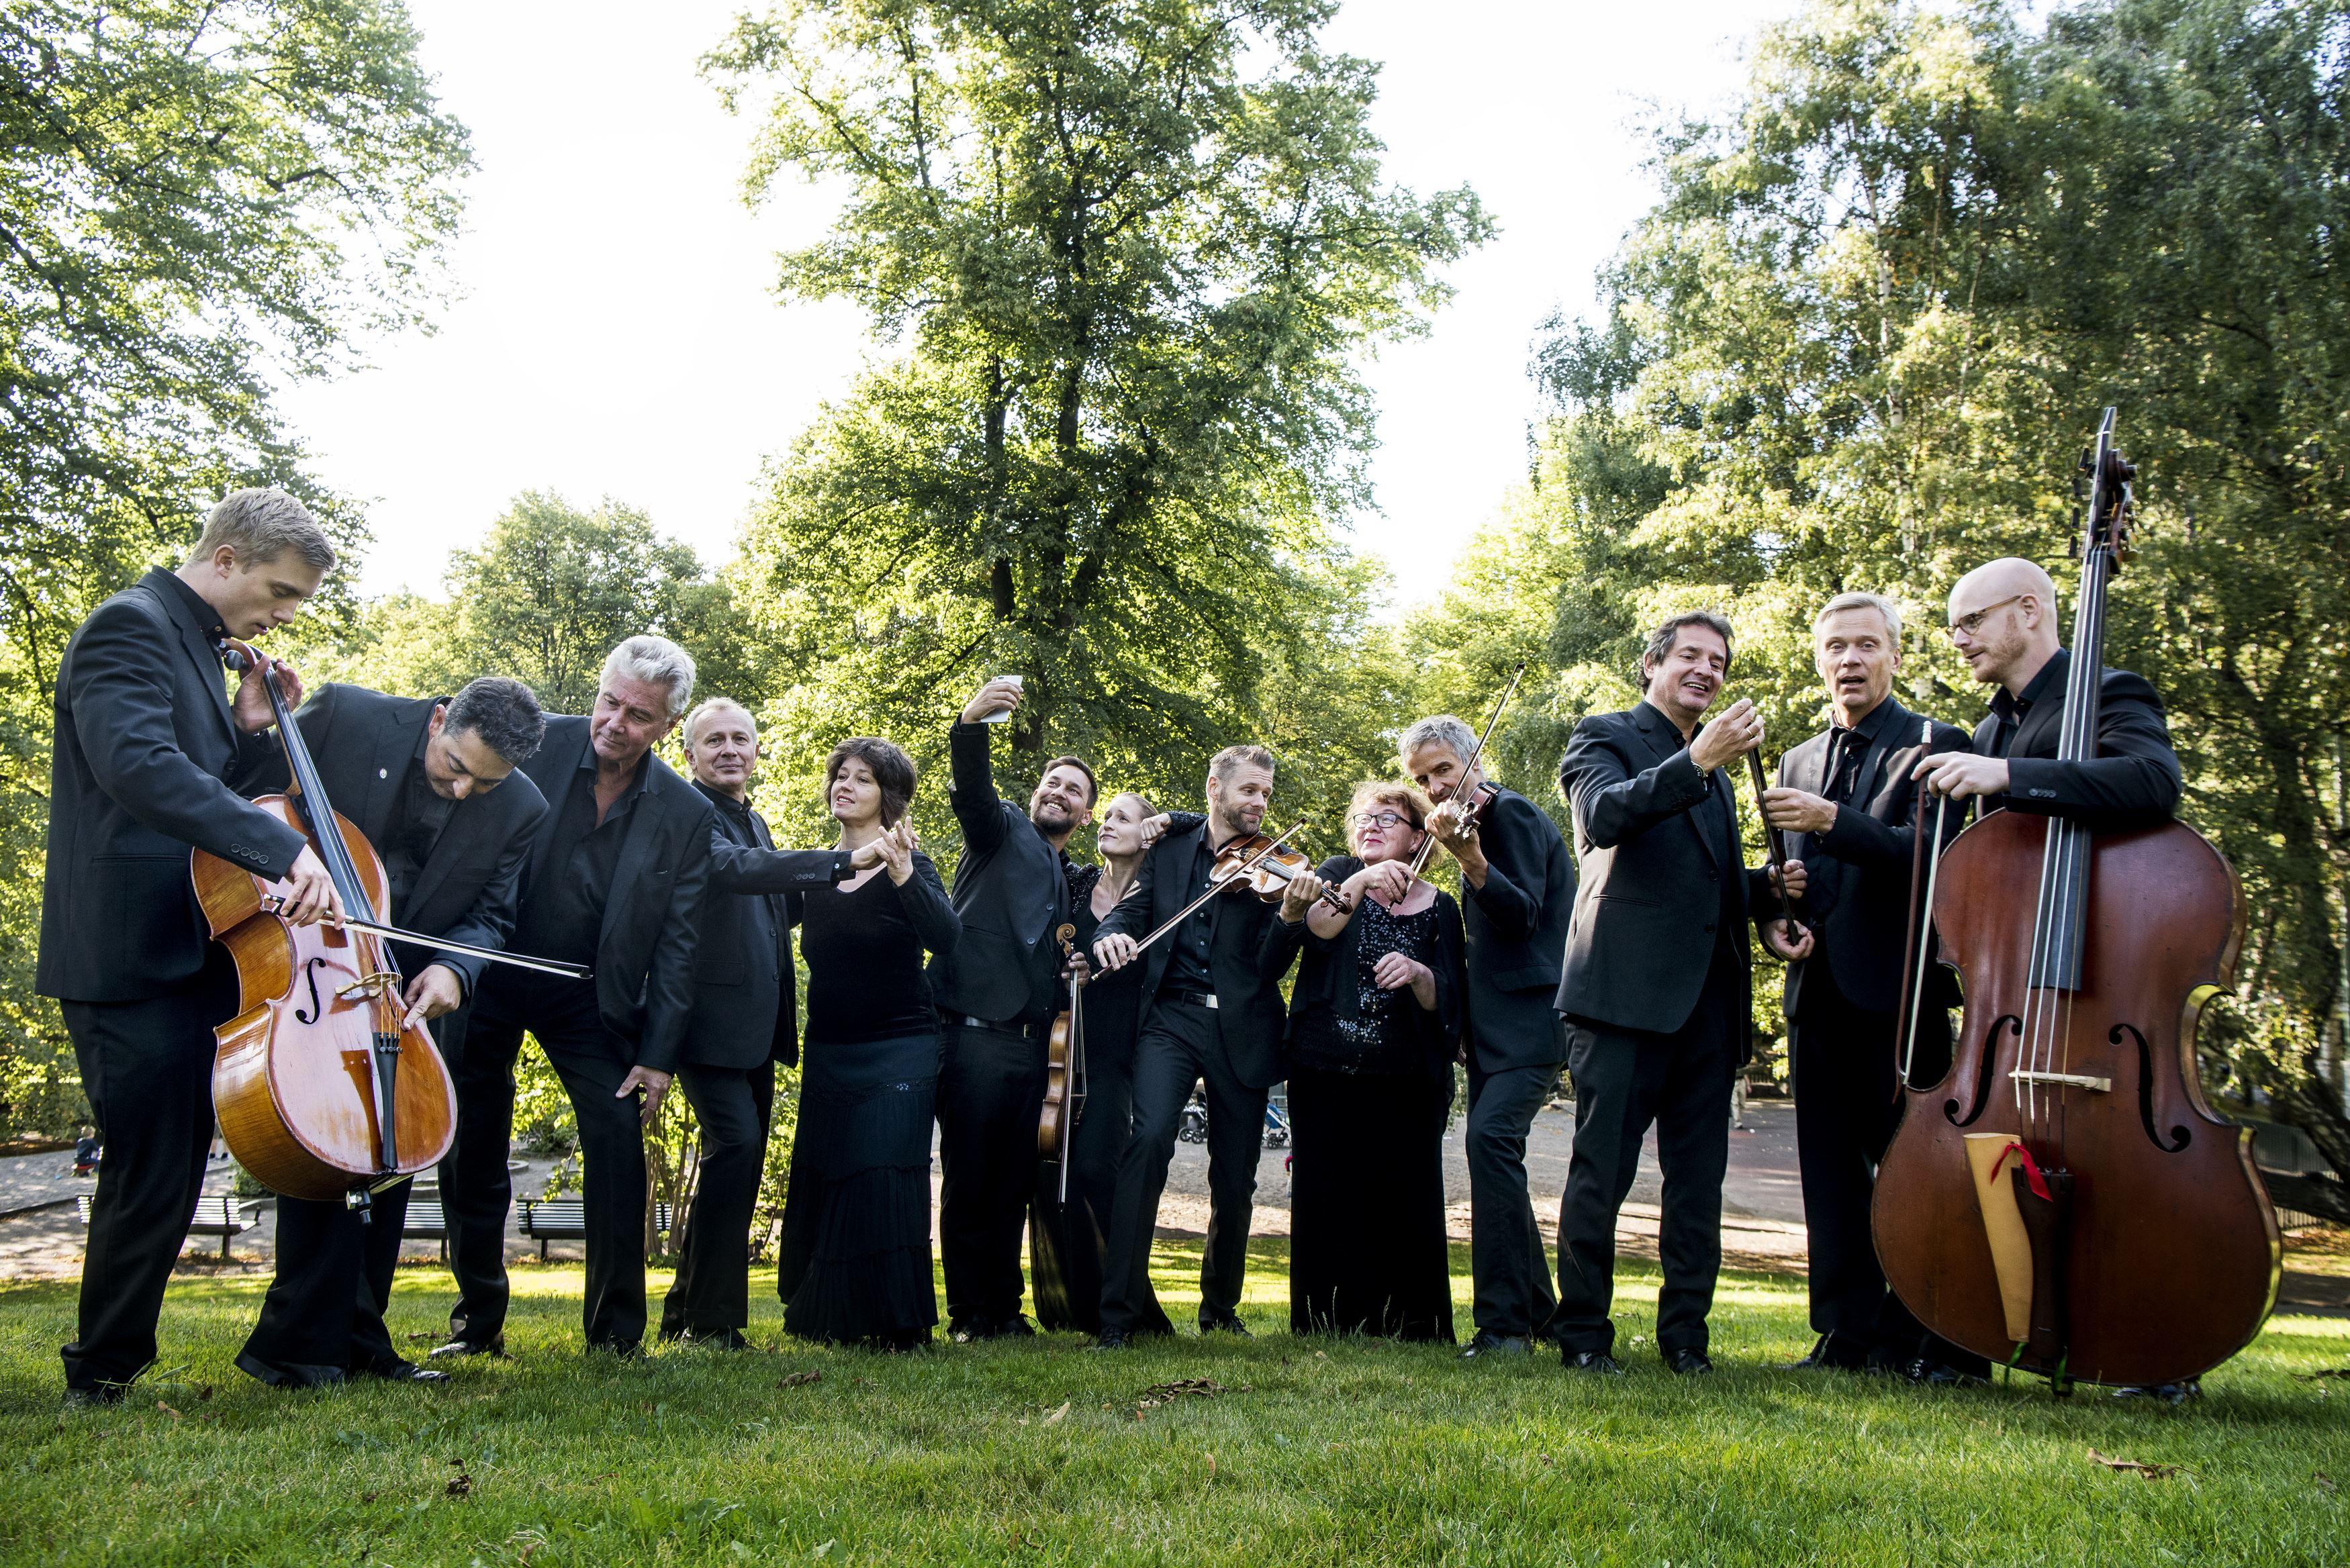 Musik: Scensommar - Musica vitae & P2 i parken